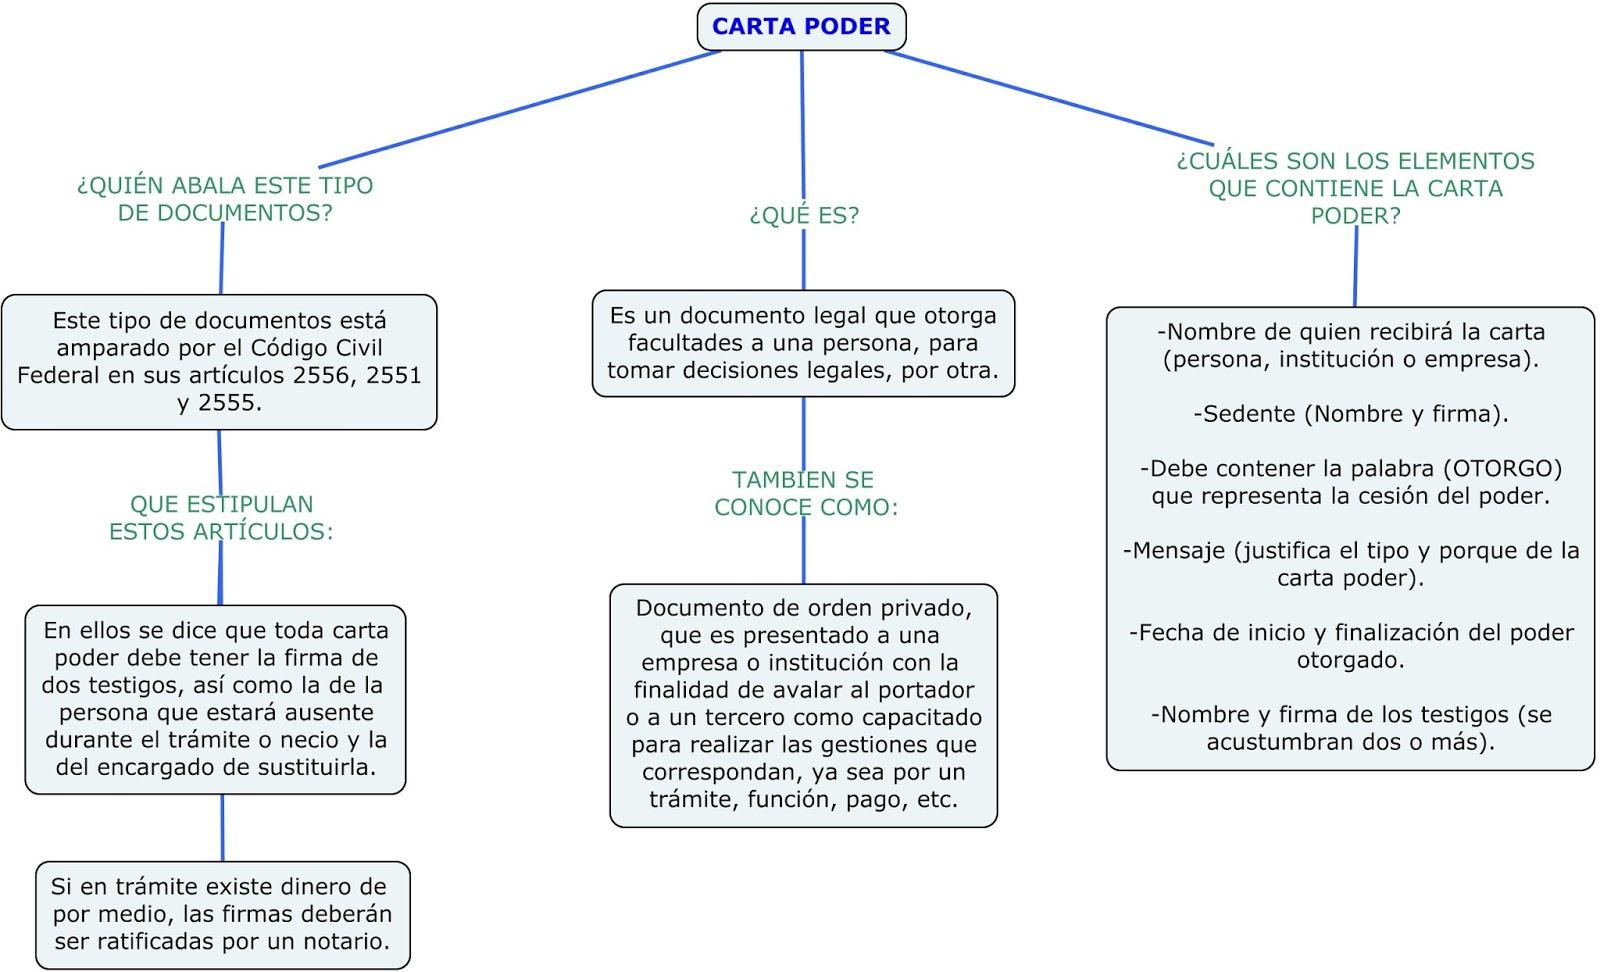 Ejemplos De Mapa Conceptual.Mapa Conceptual De La Carta Poder Incluye Ejemplo